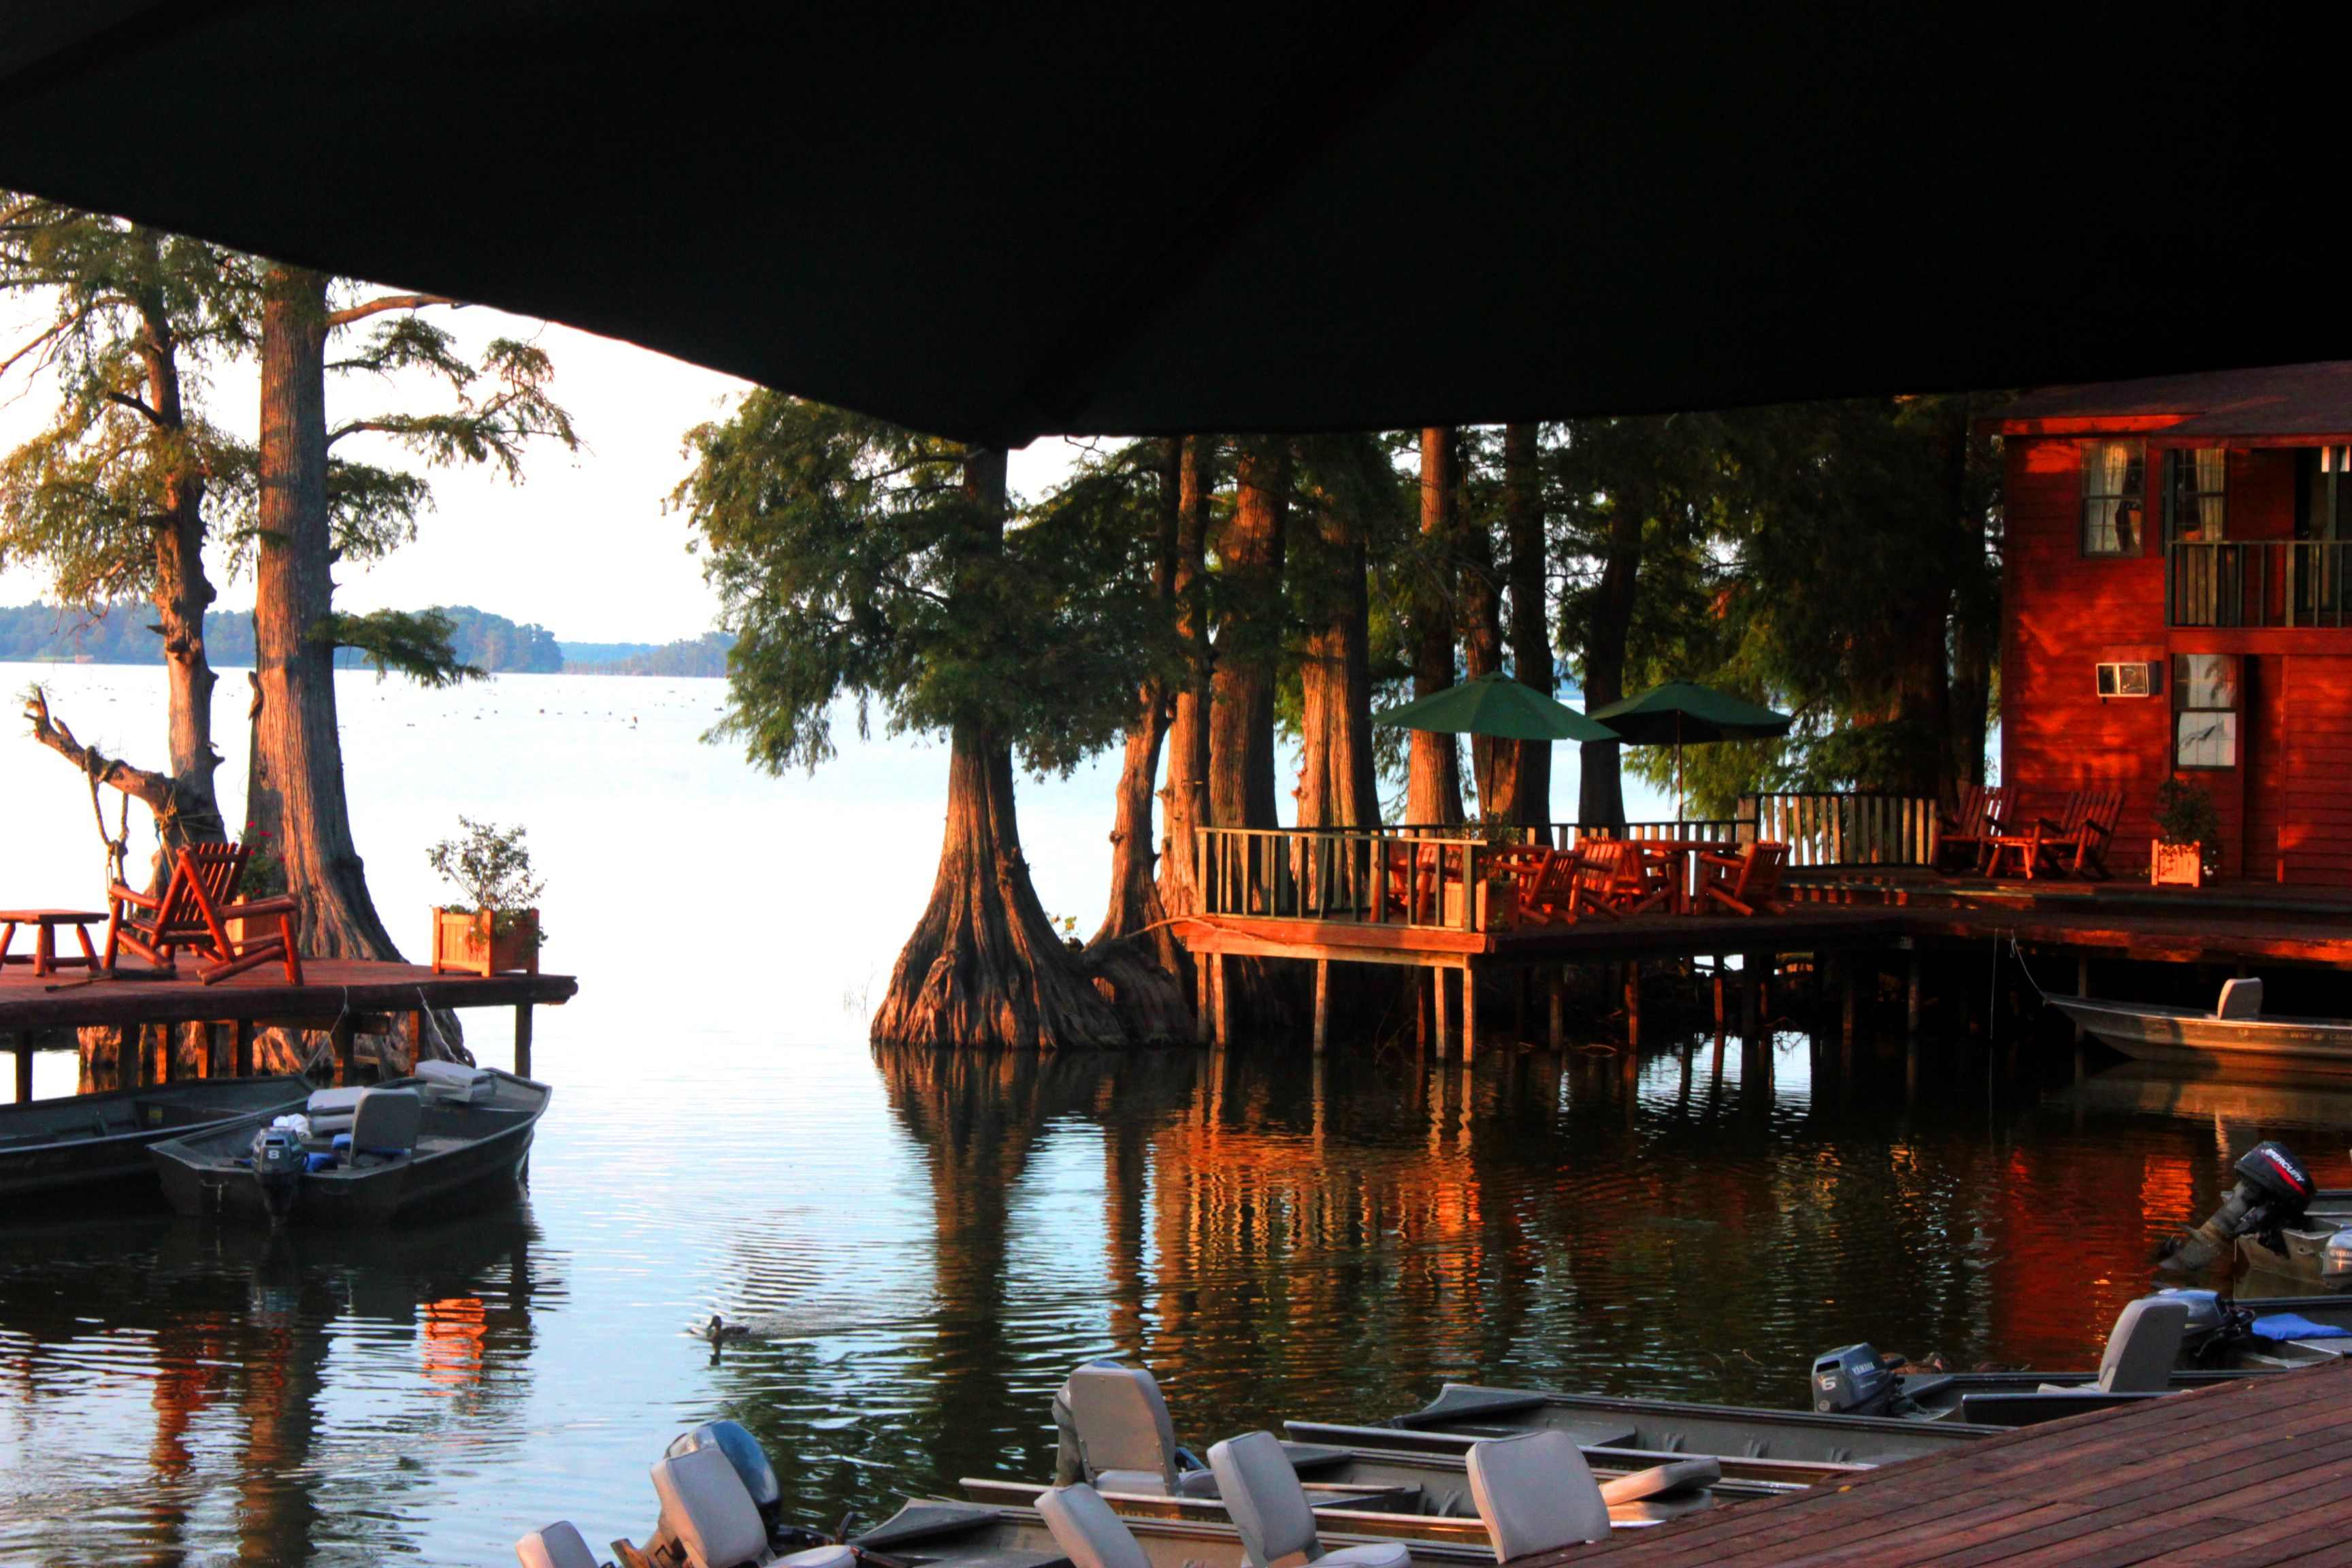 Blue Bank Resort in Reelfoot TN   My Photos   Scenery, Fish